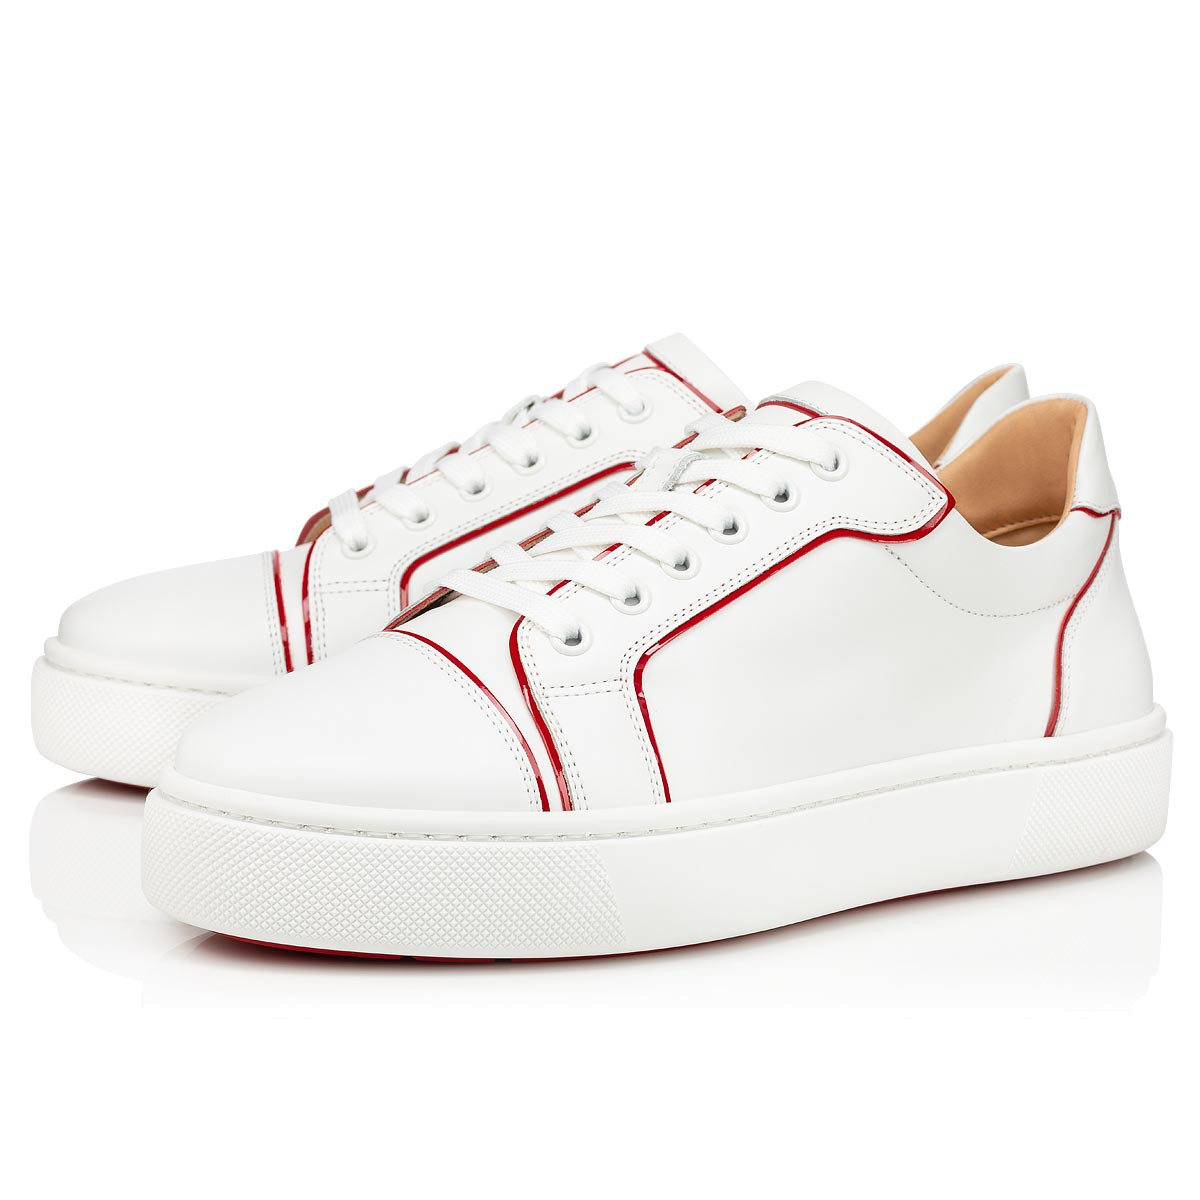 womens christian louboutin sneakers